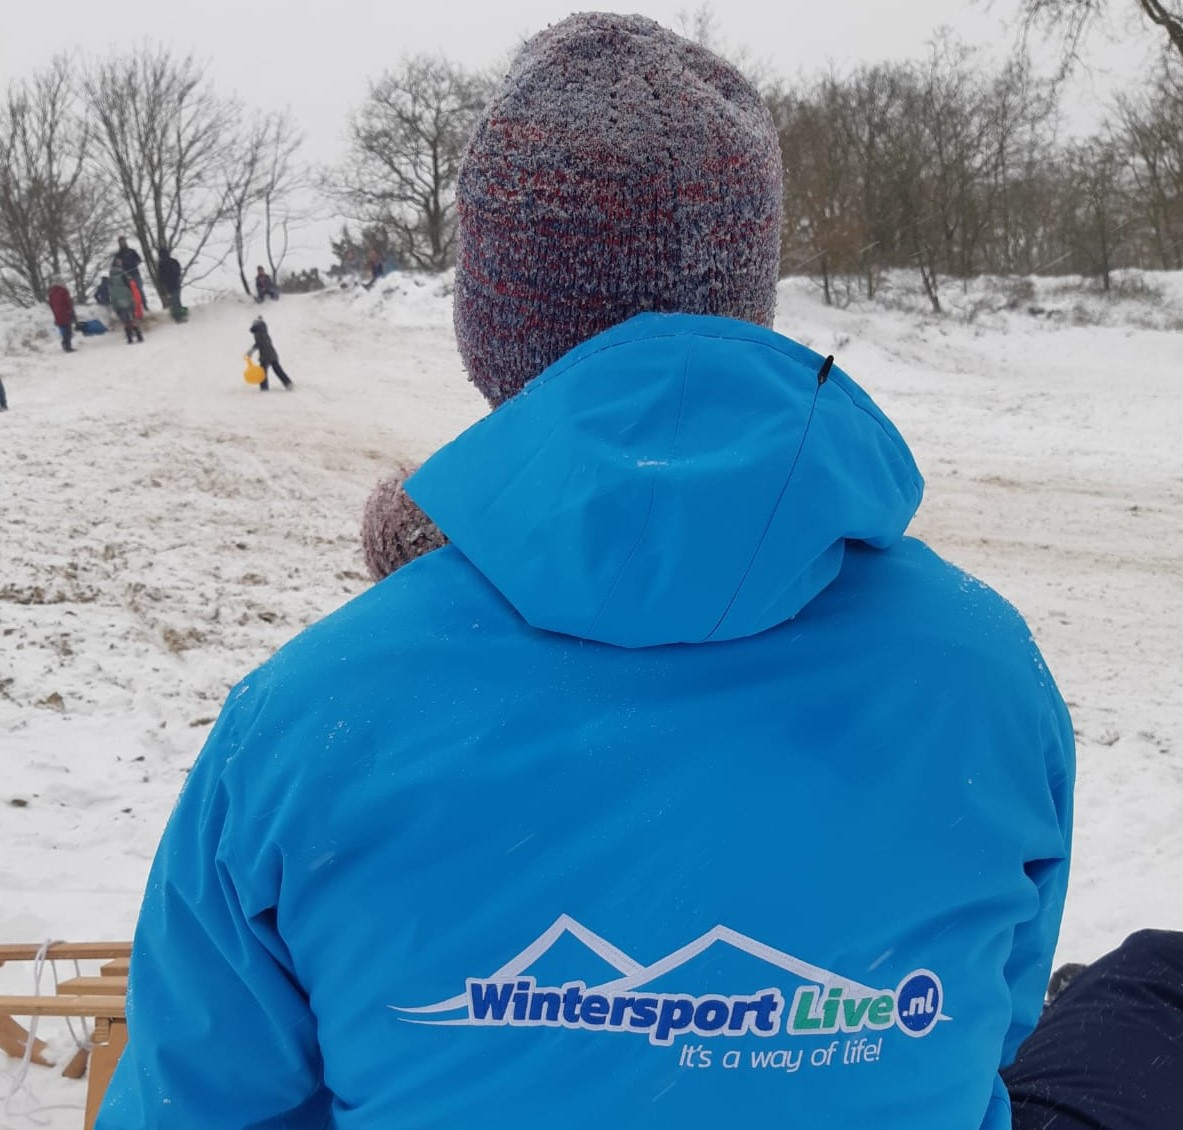 Wintersport Live in Den Haag